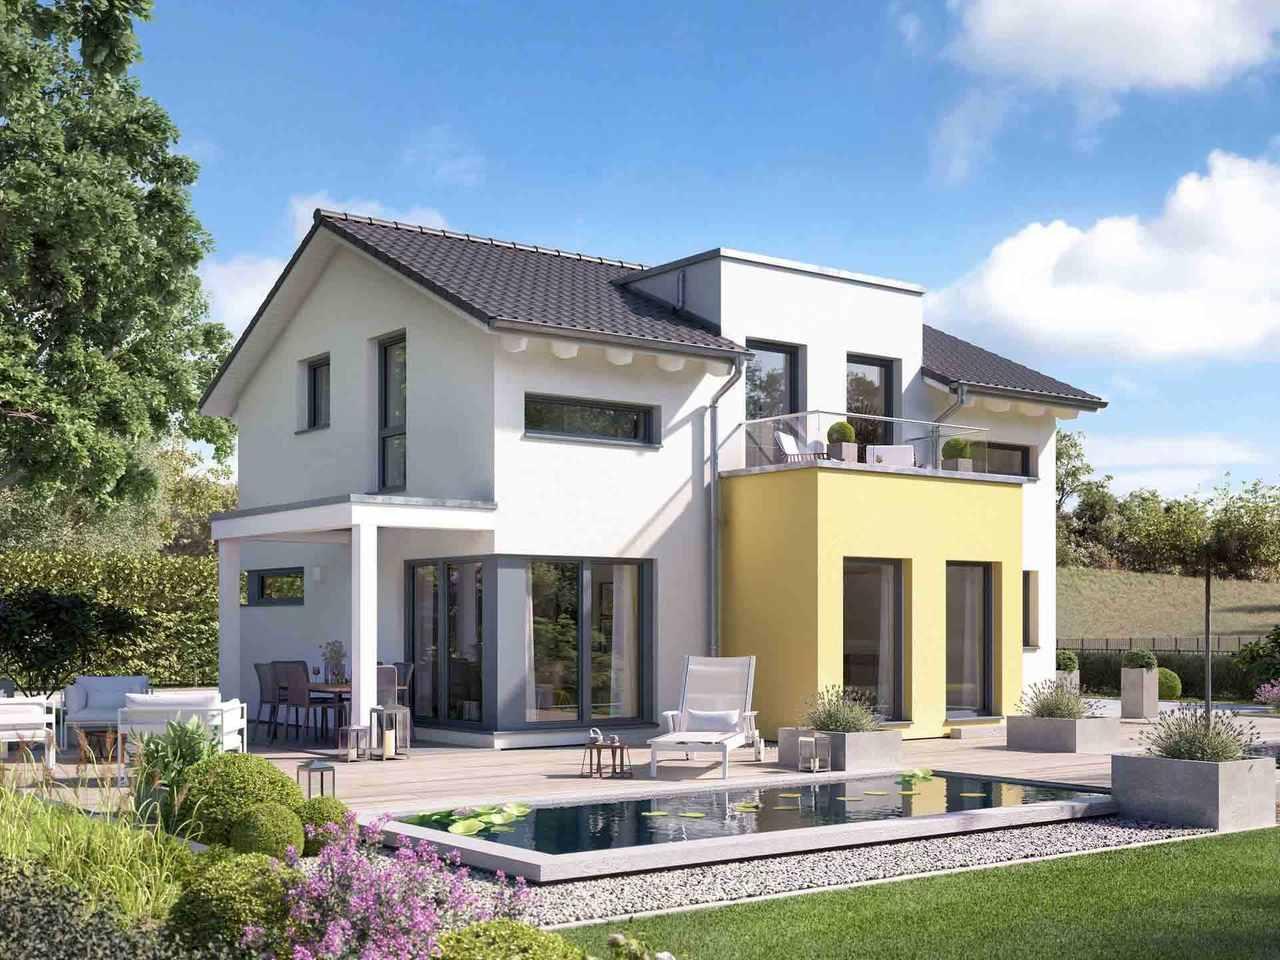 Einfamilienhaus Solitaire-E-125 E5 - Schwabenhaus